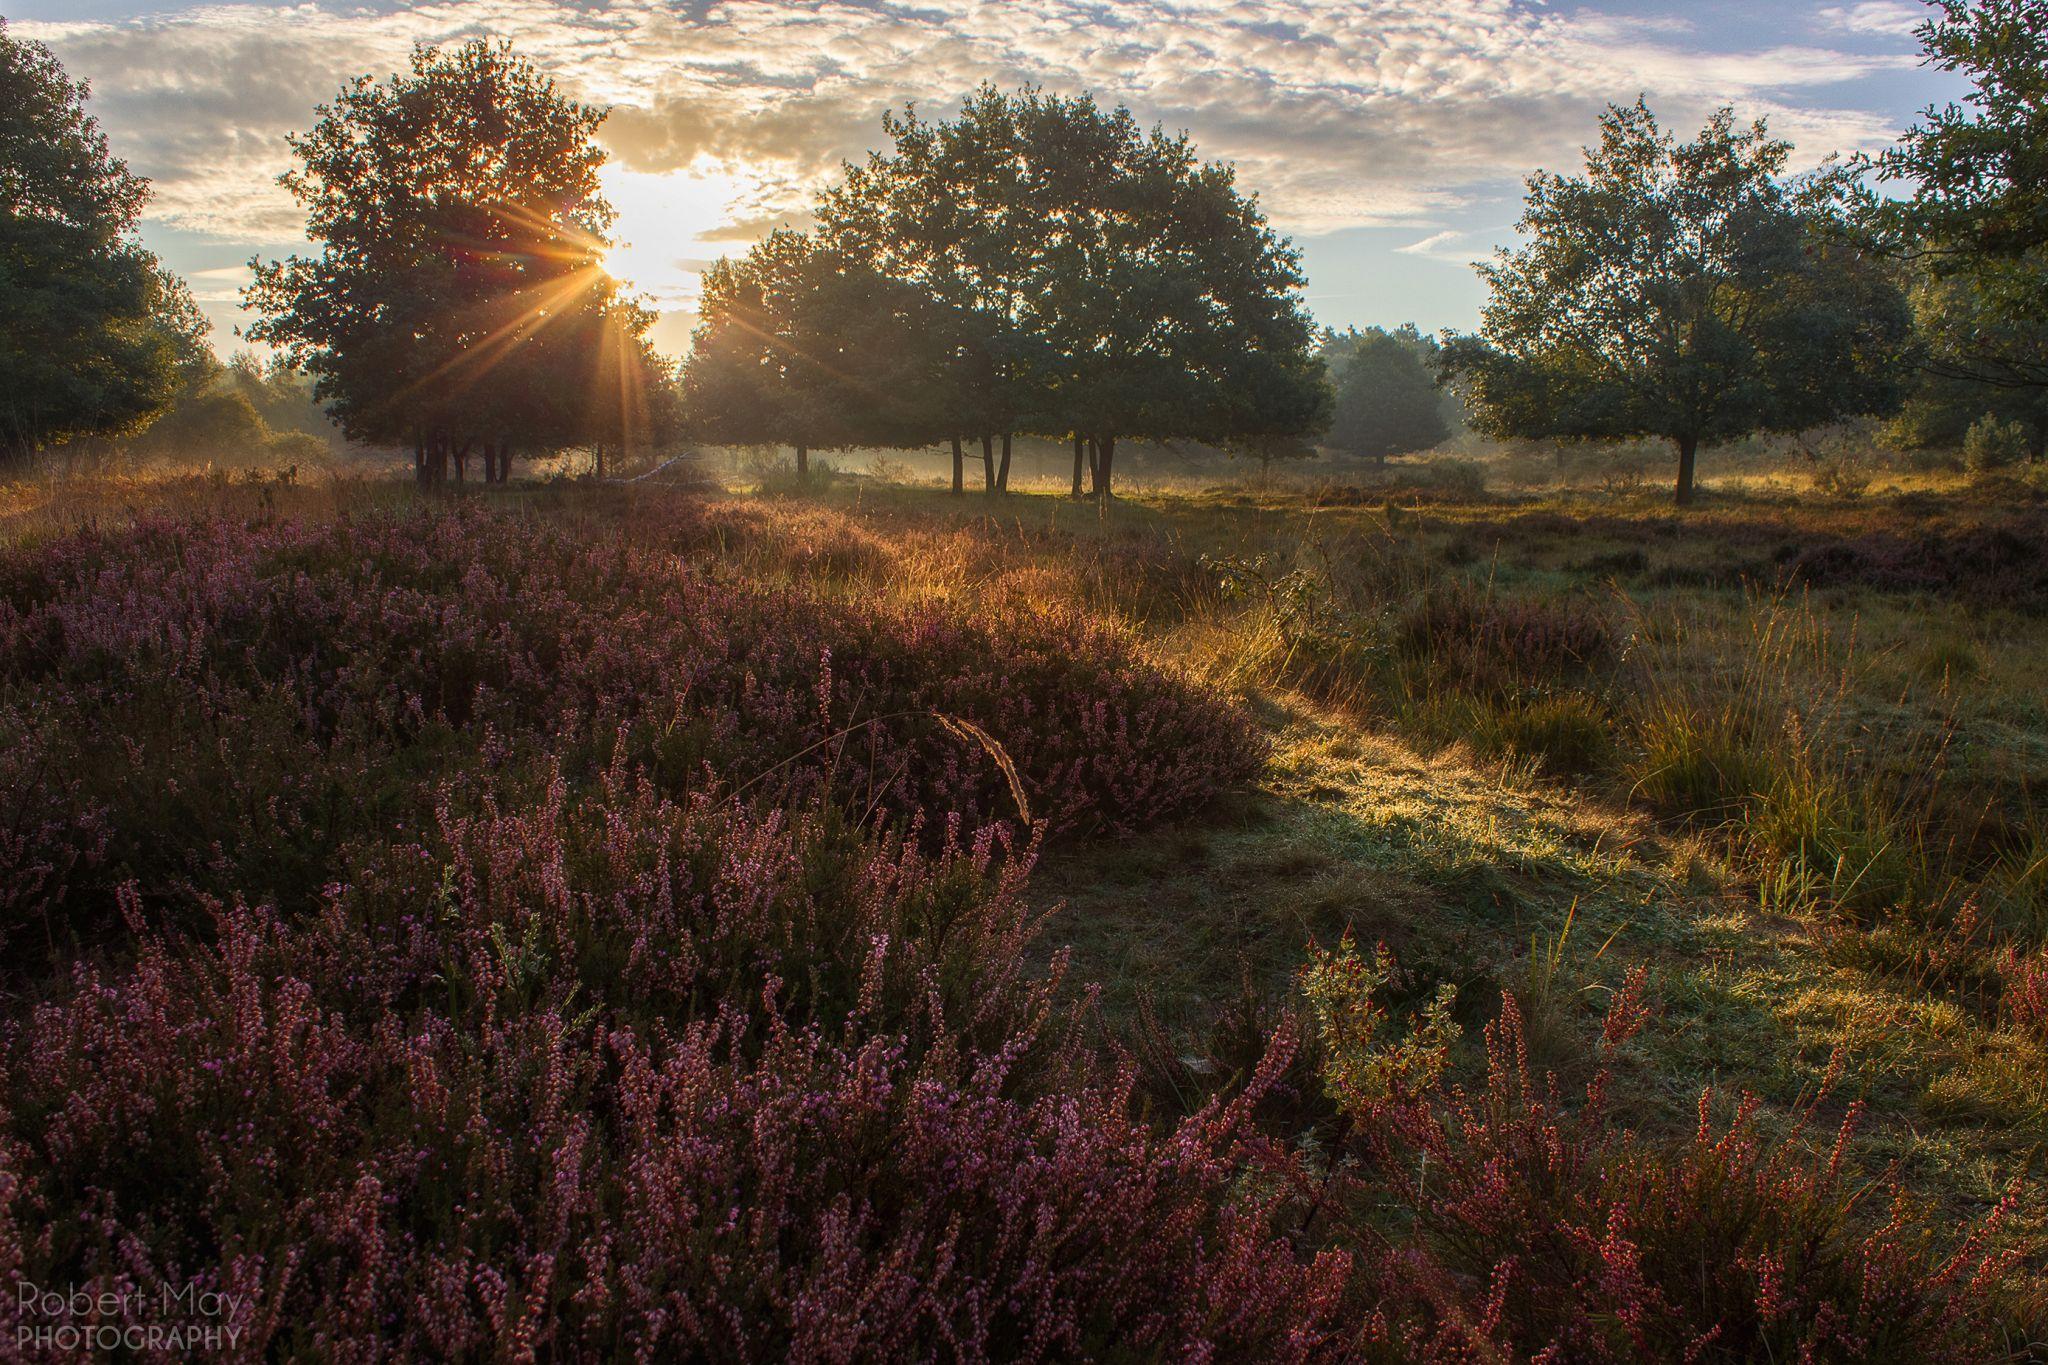 Wahner Heide, Germany